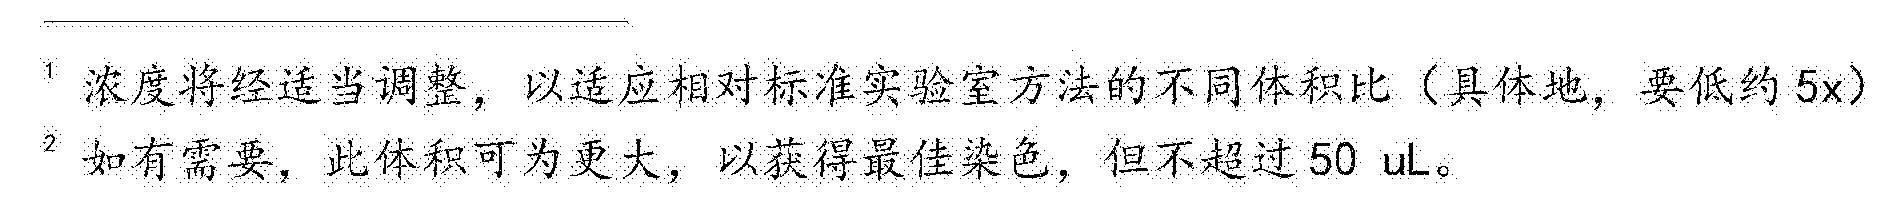 Figure CN106290160AD00271